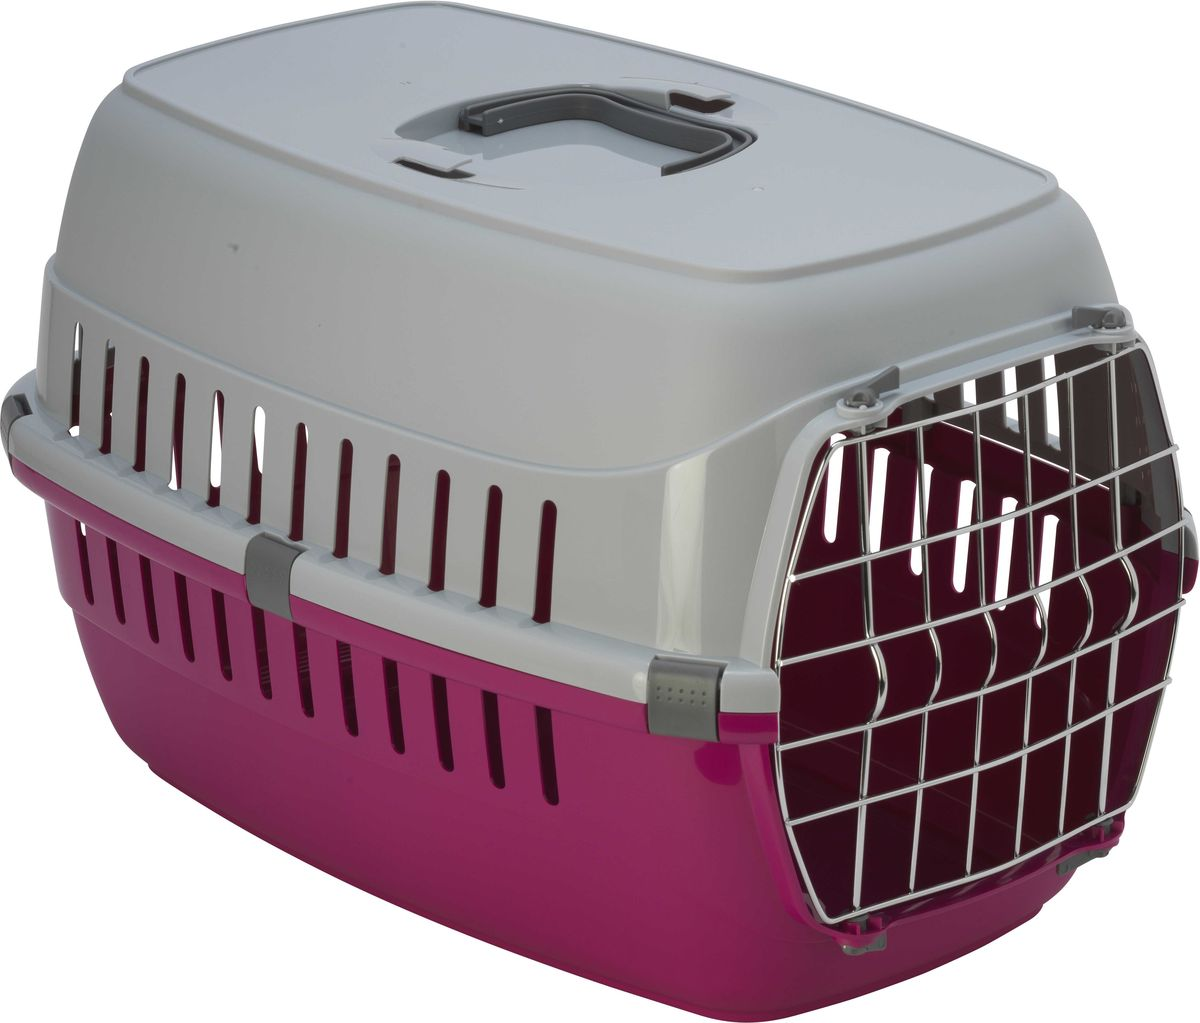 Переноска для животных Moderna  Roadrunner 1 , с металлической дверью, цвет: ярко-розовый, 31 х 51 х 34 см